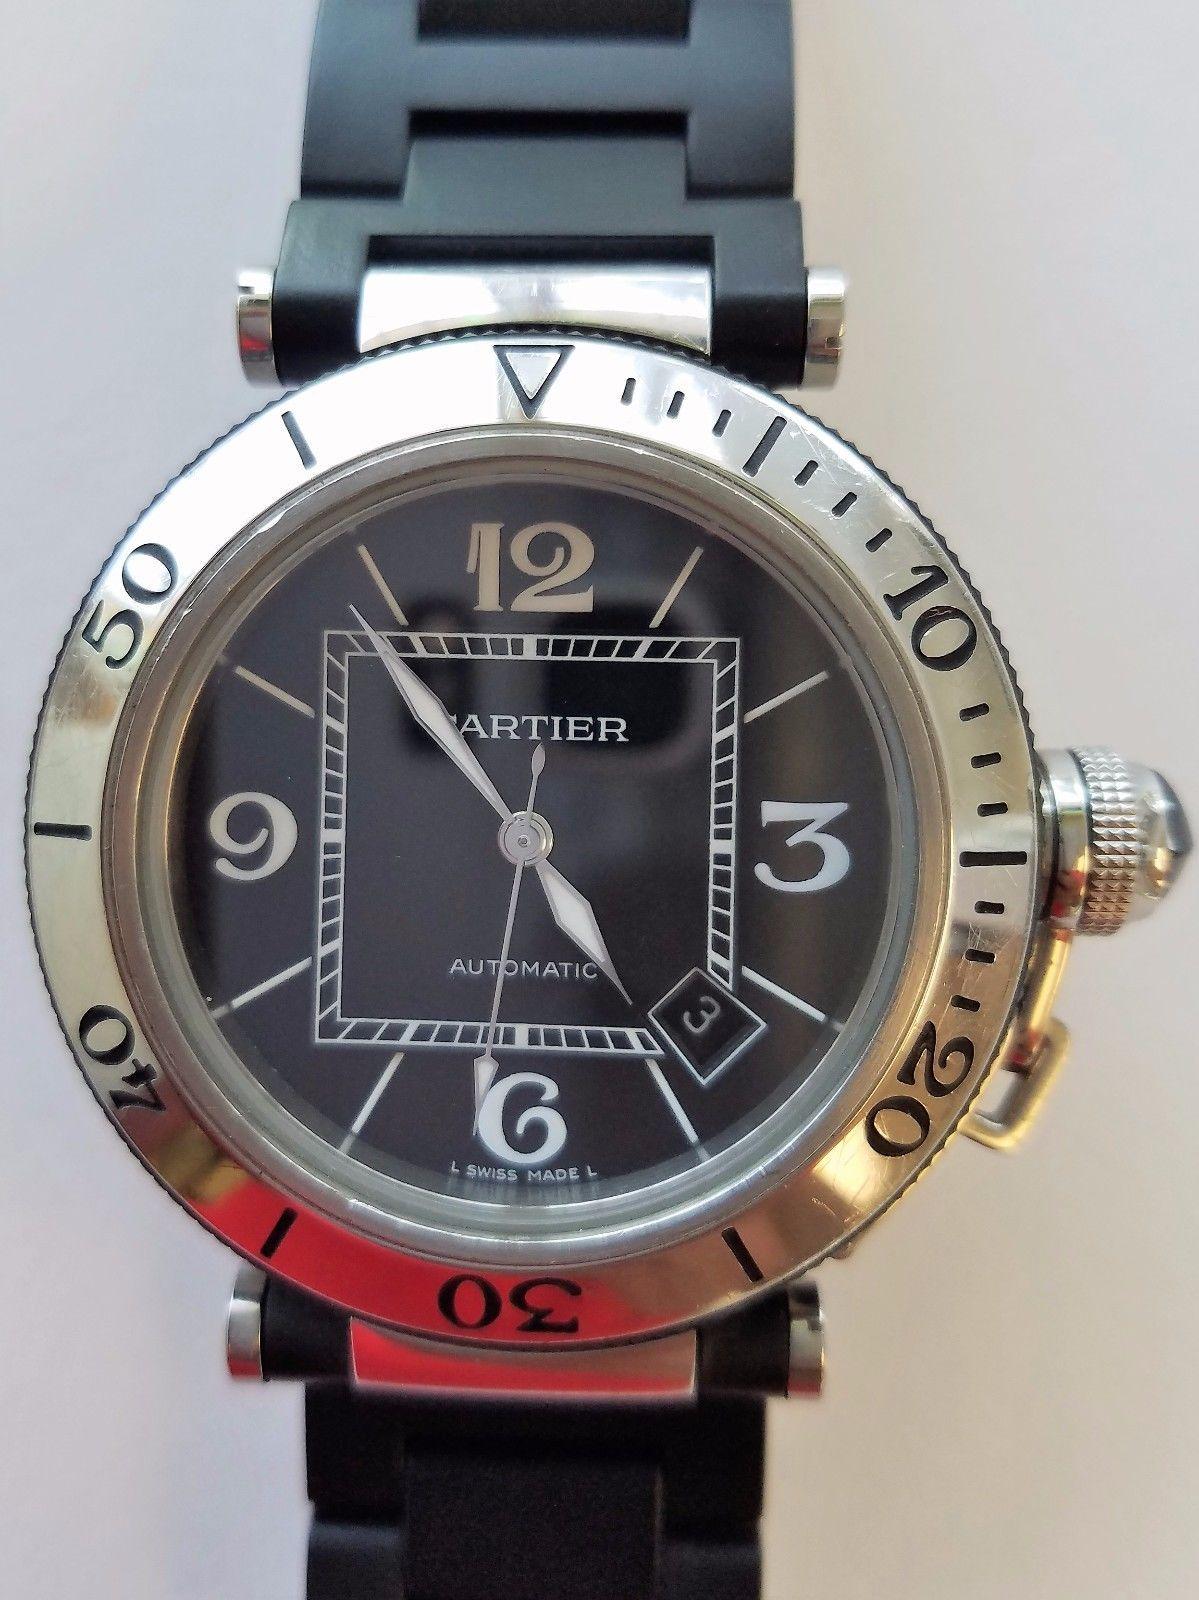 cdf56db249b3 Pre-Owned Cartier Pasha Seatimer Automatic Steel Men s Watch Ref  2790  W31077U2